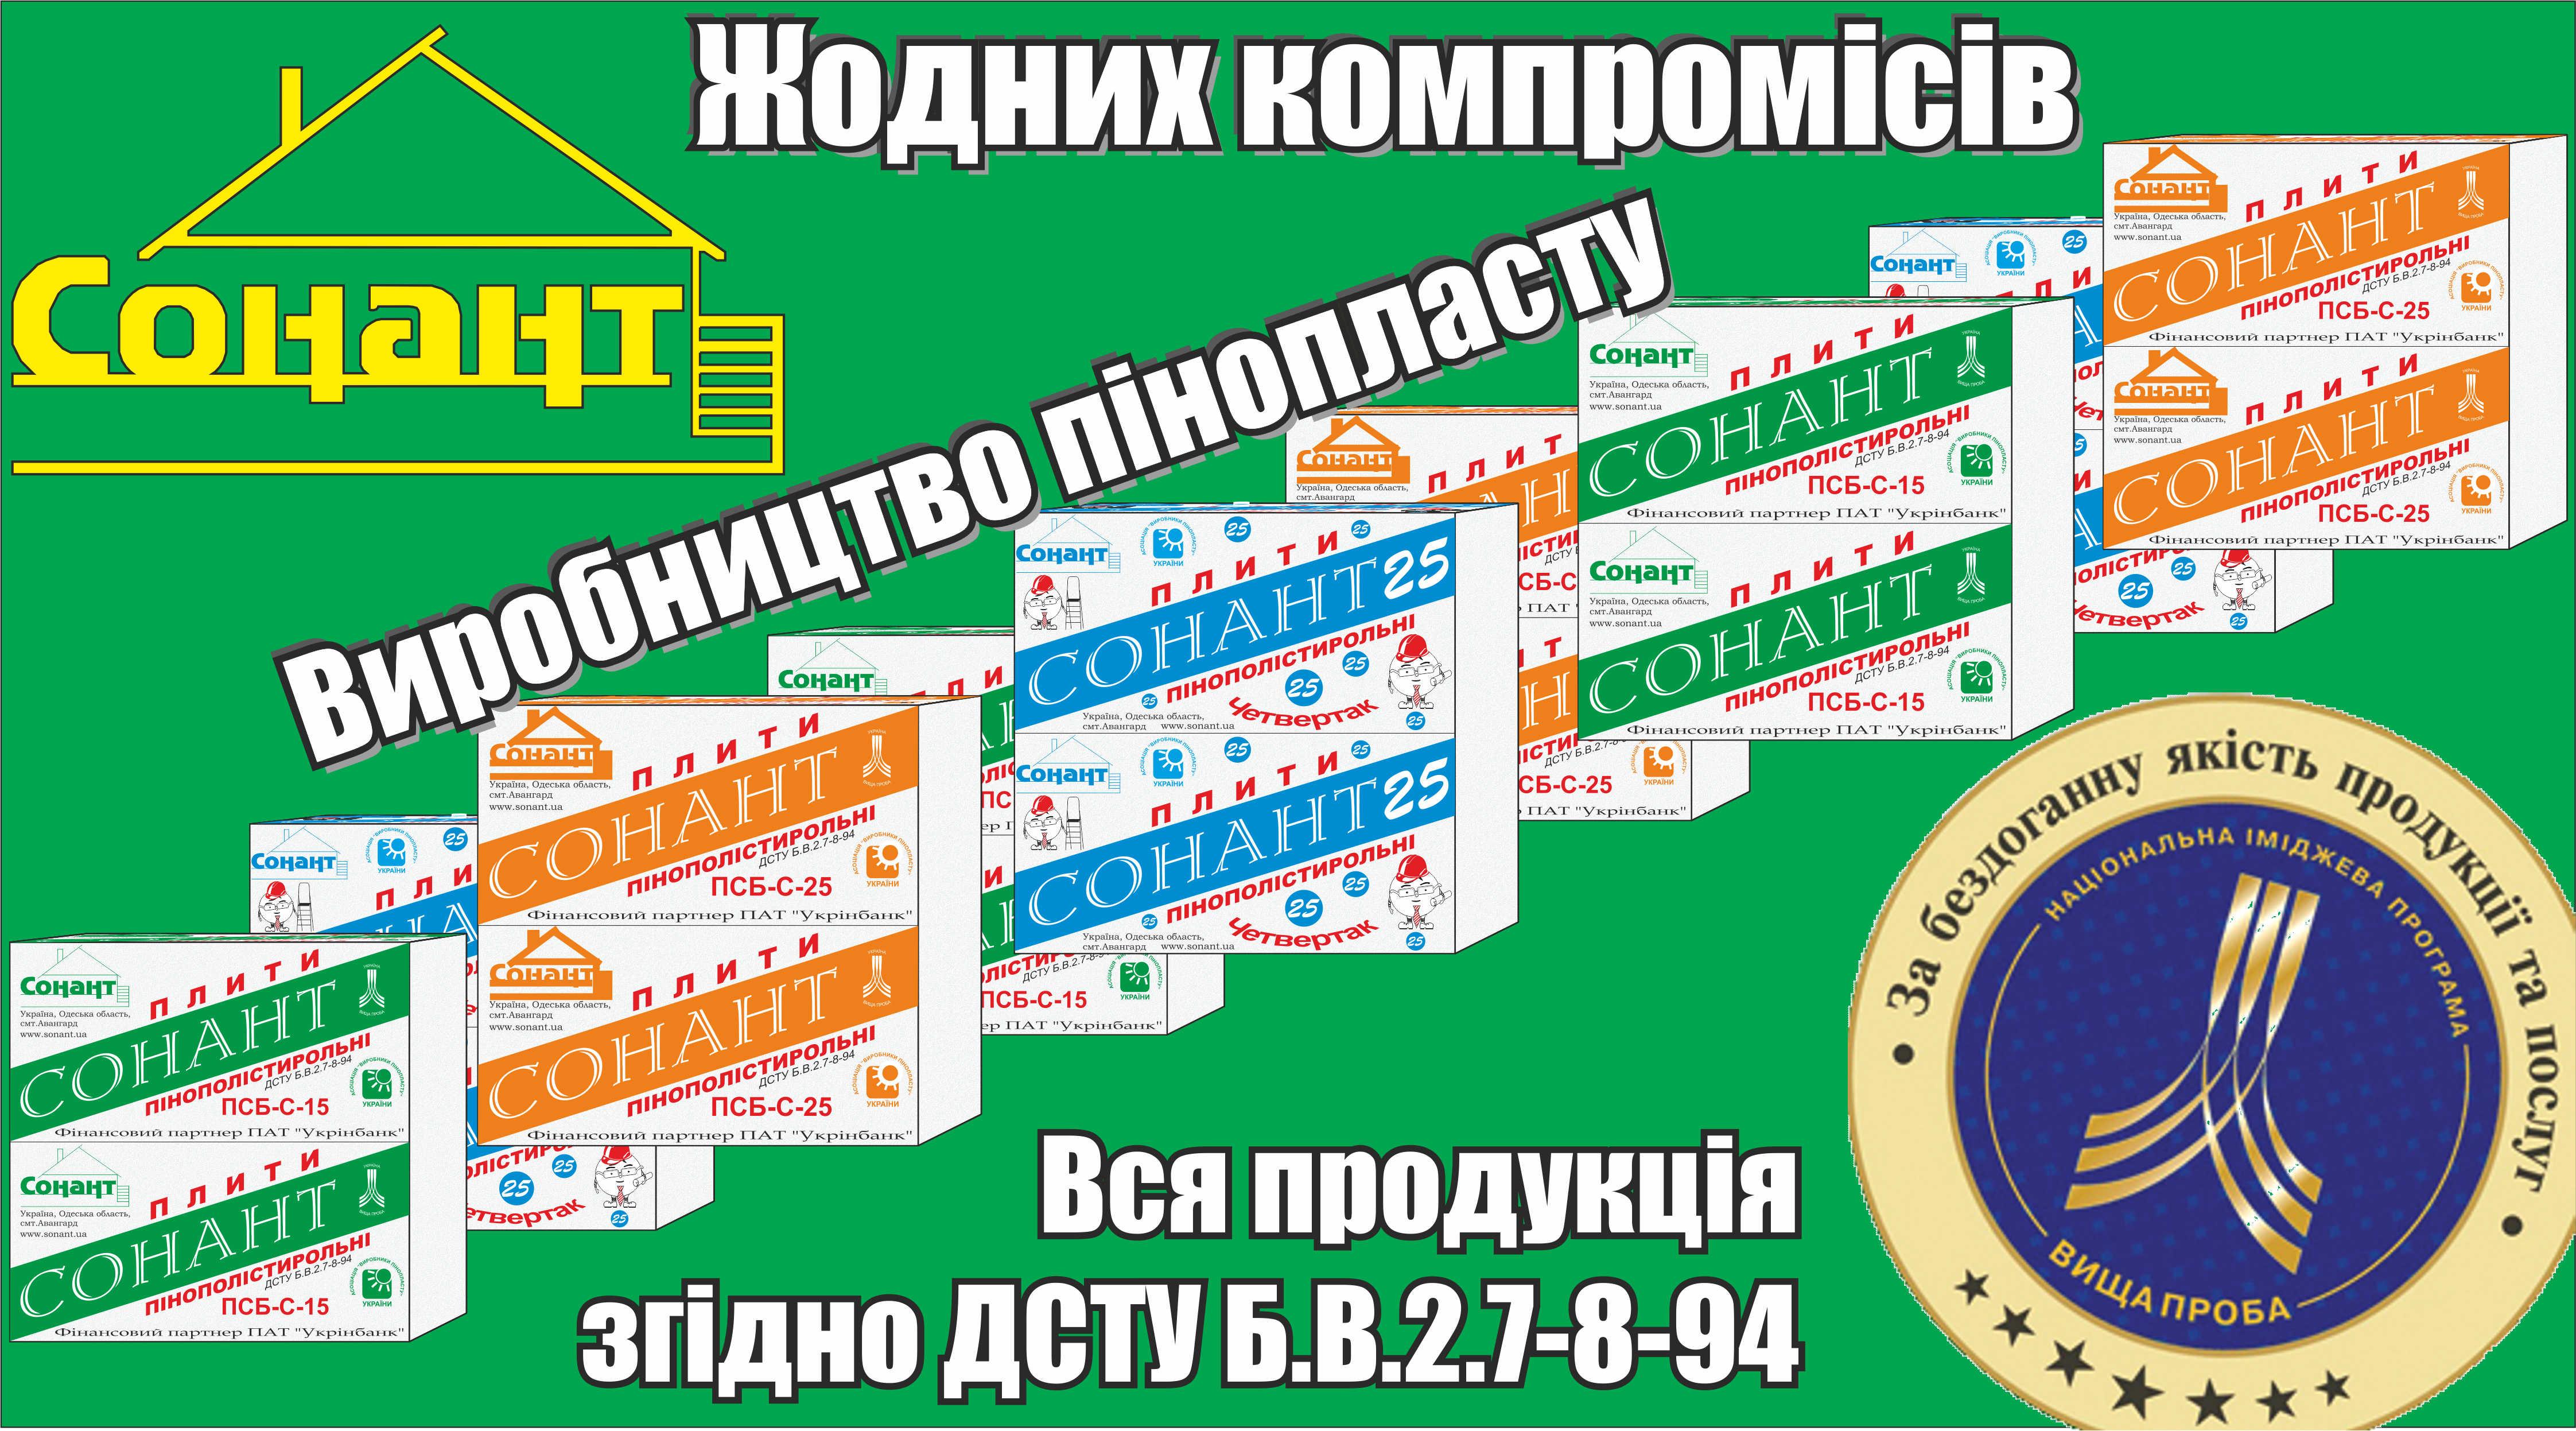 Пенопласт ПСБ-С 25